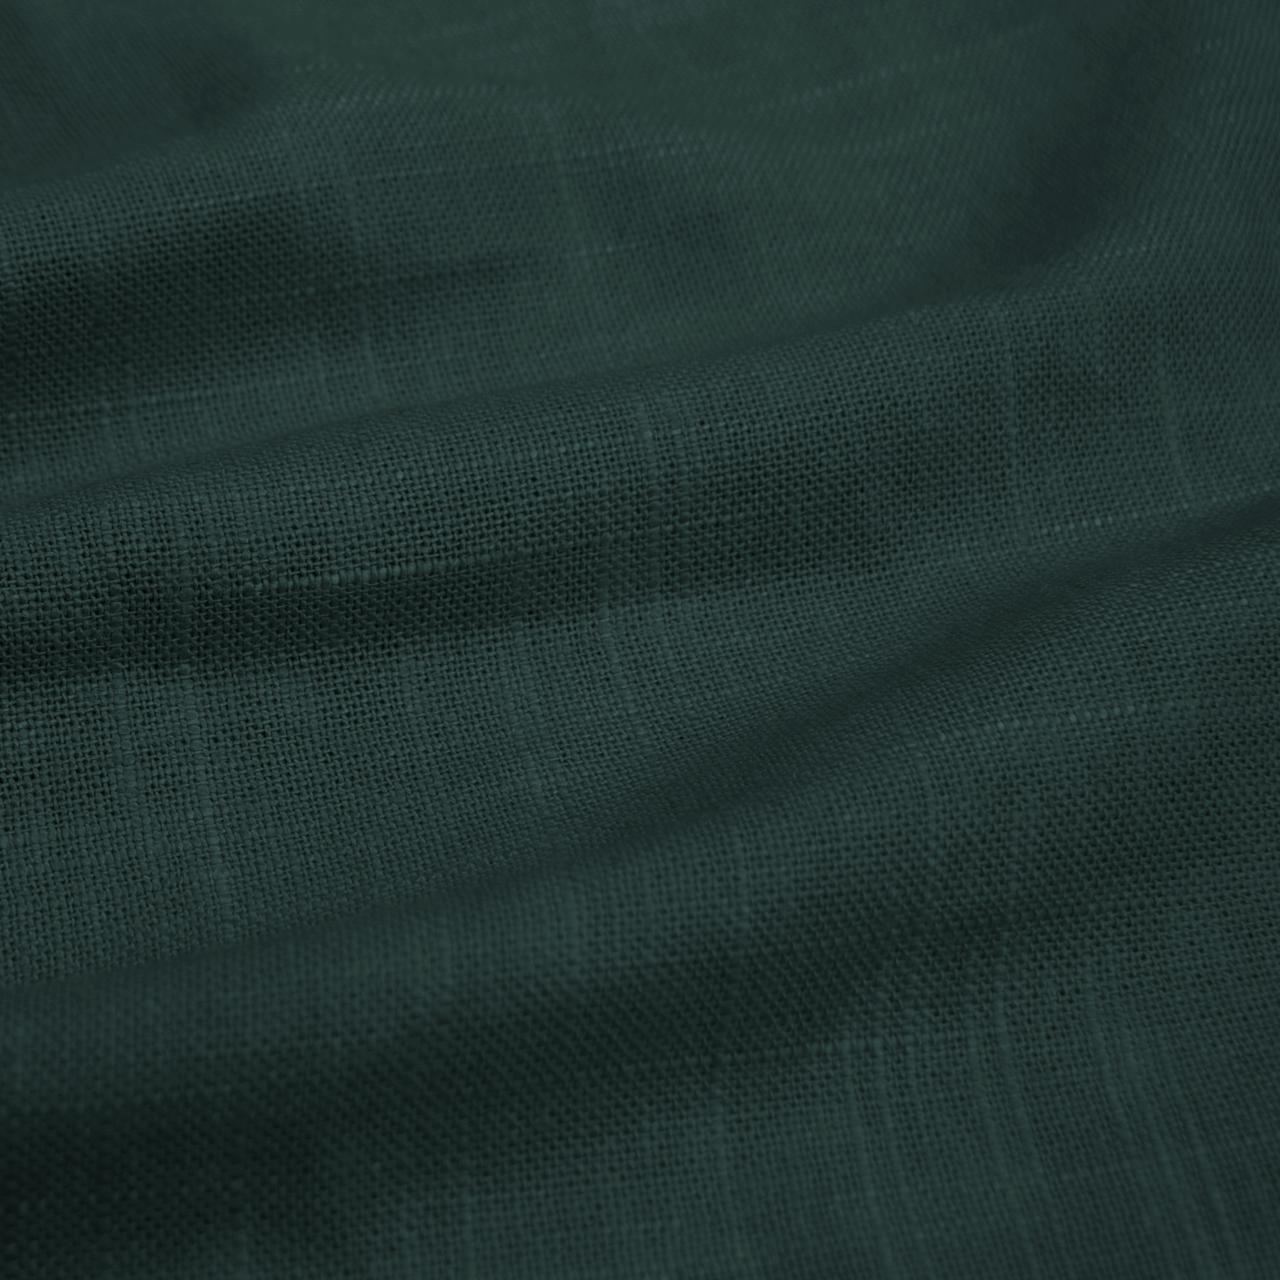 Williams Headboard, Full, Linen Conifer Green, Pewter Nailheads